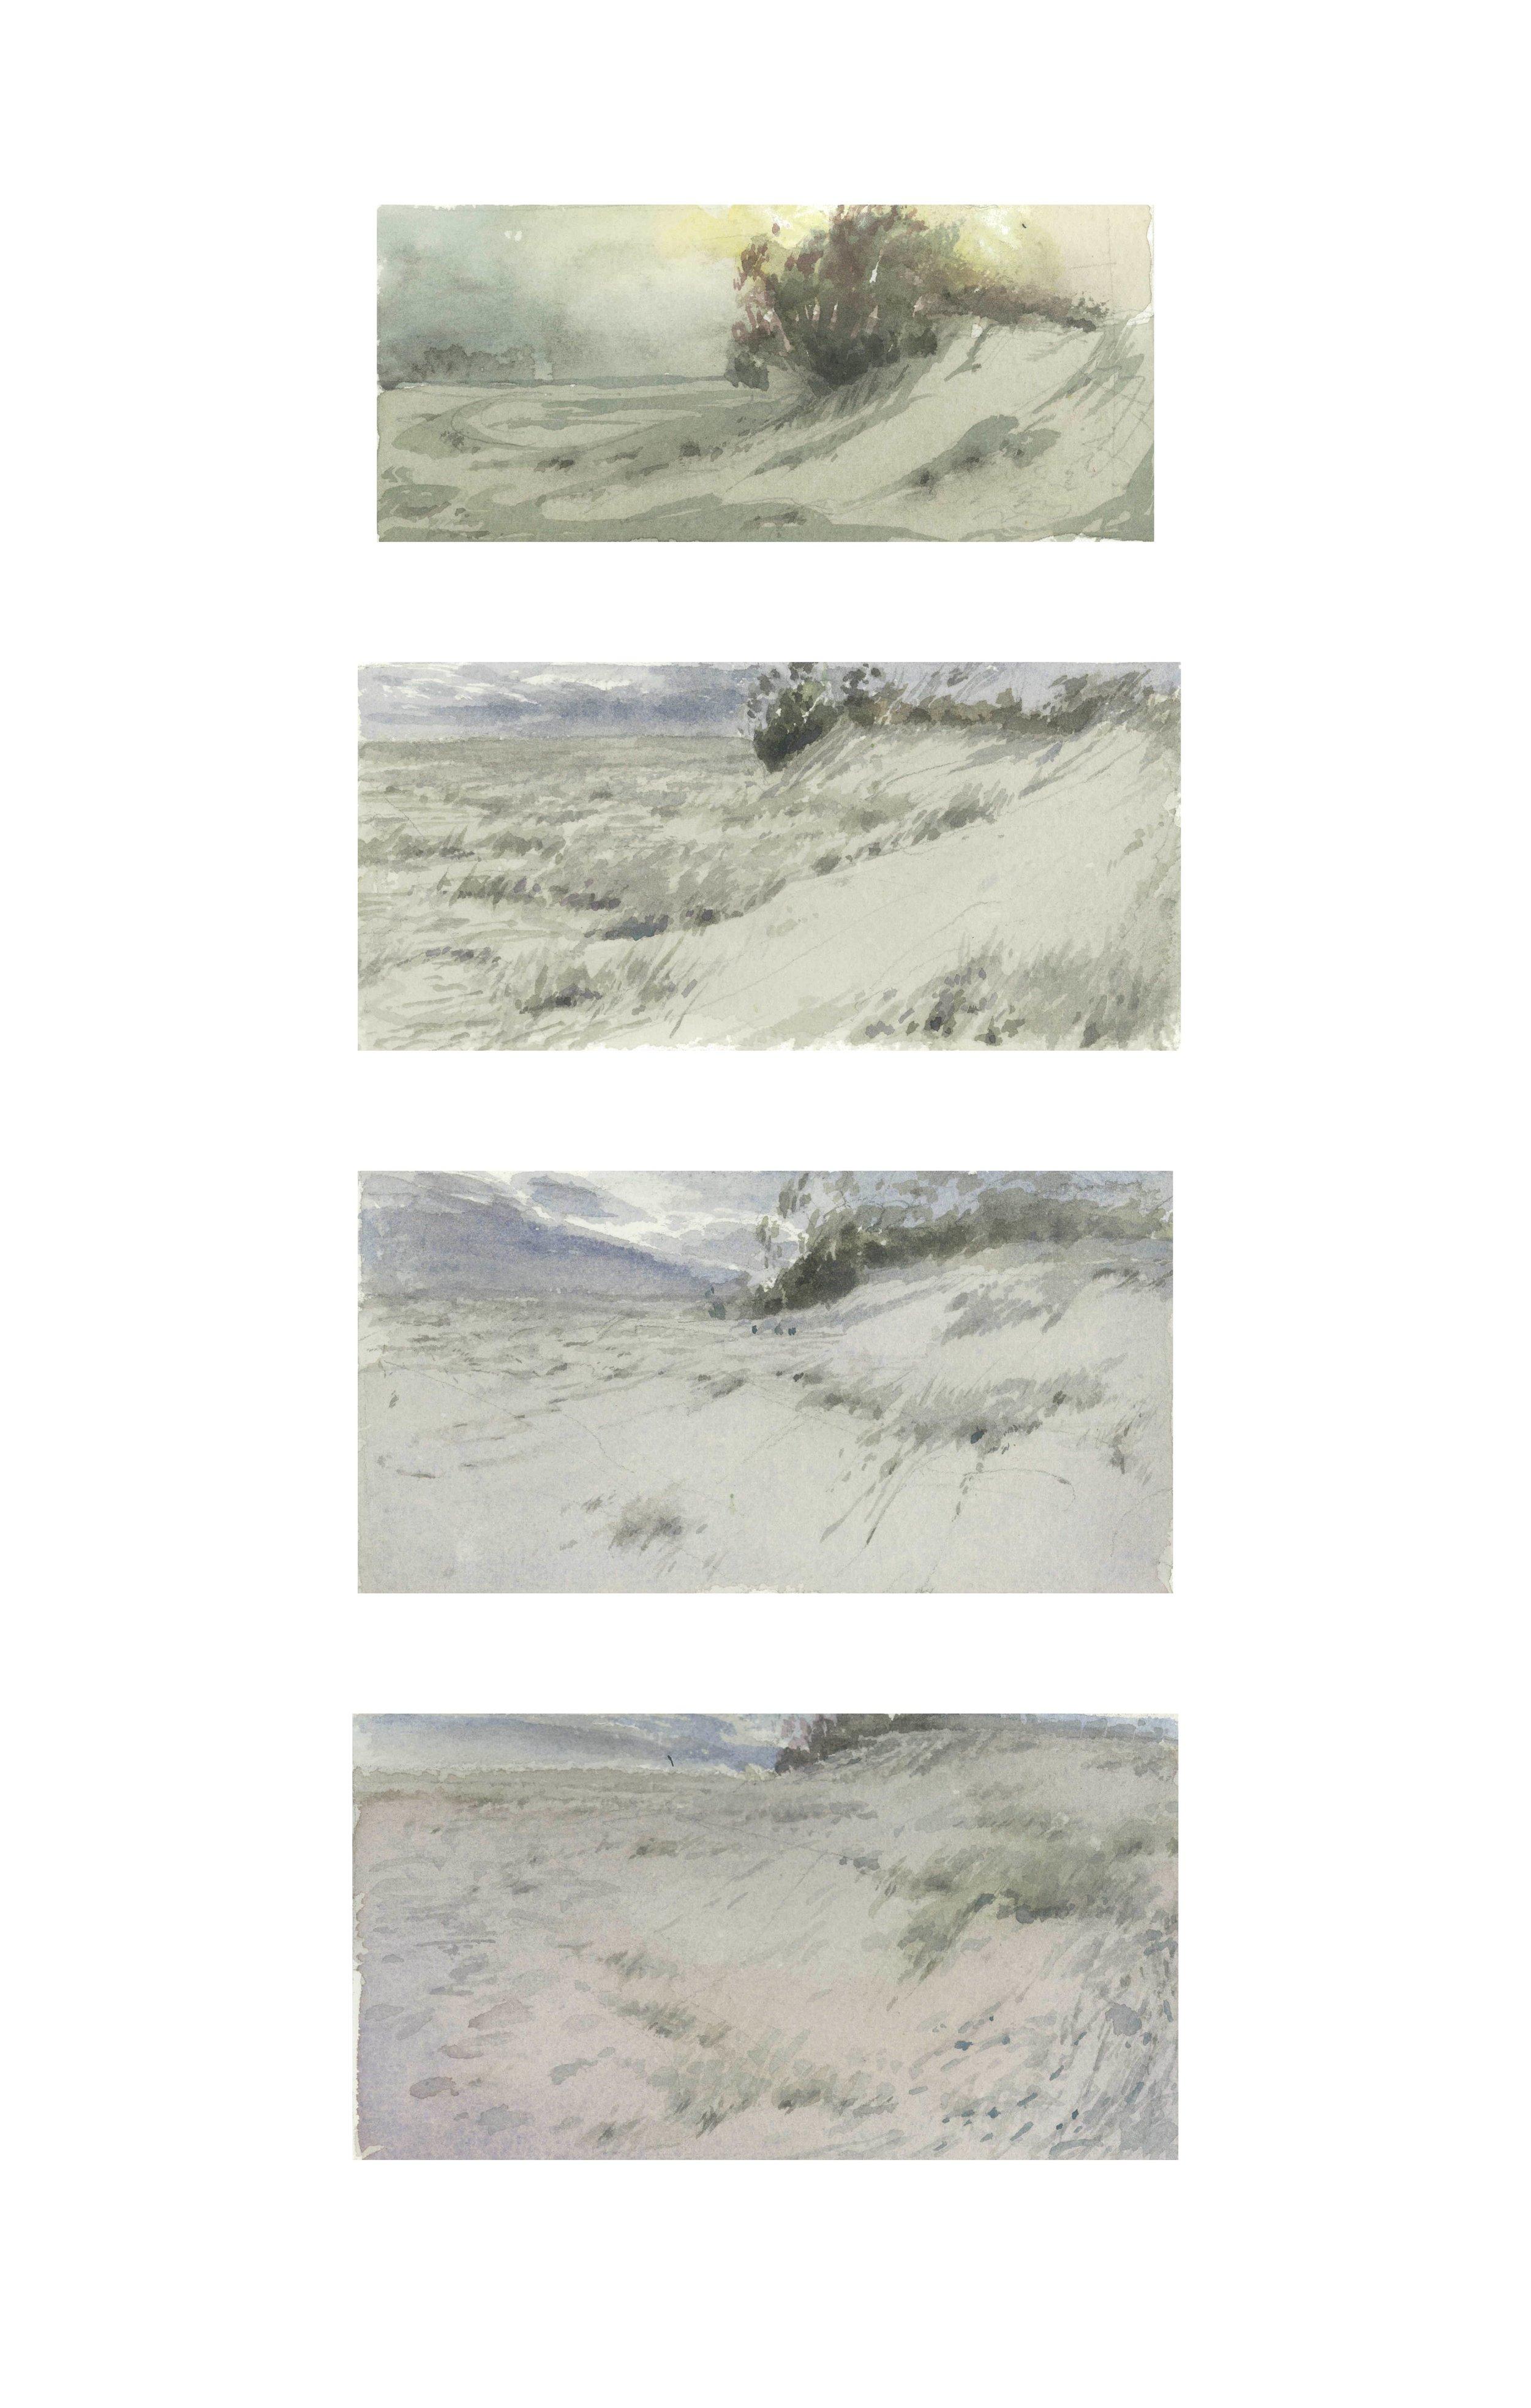 Dune Studies